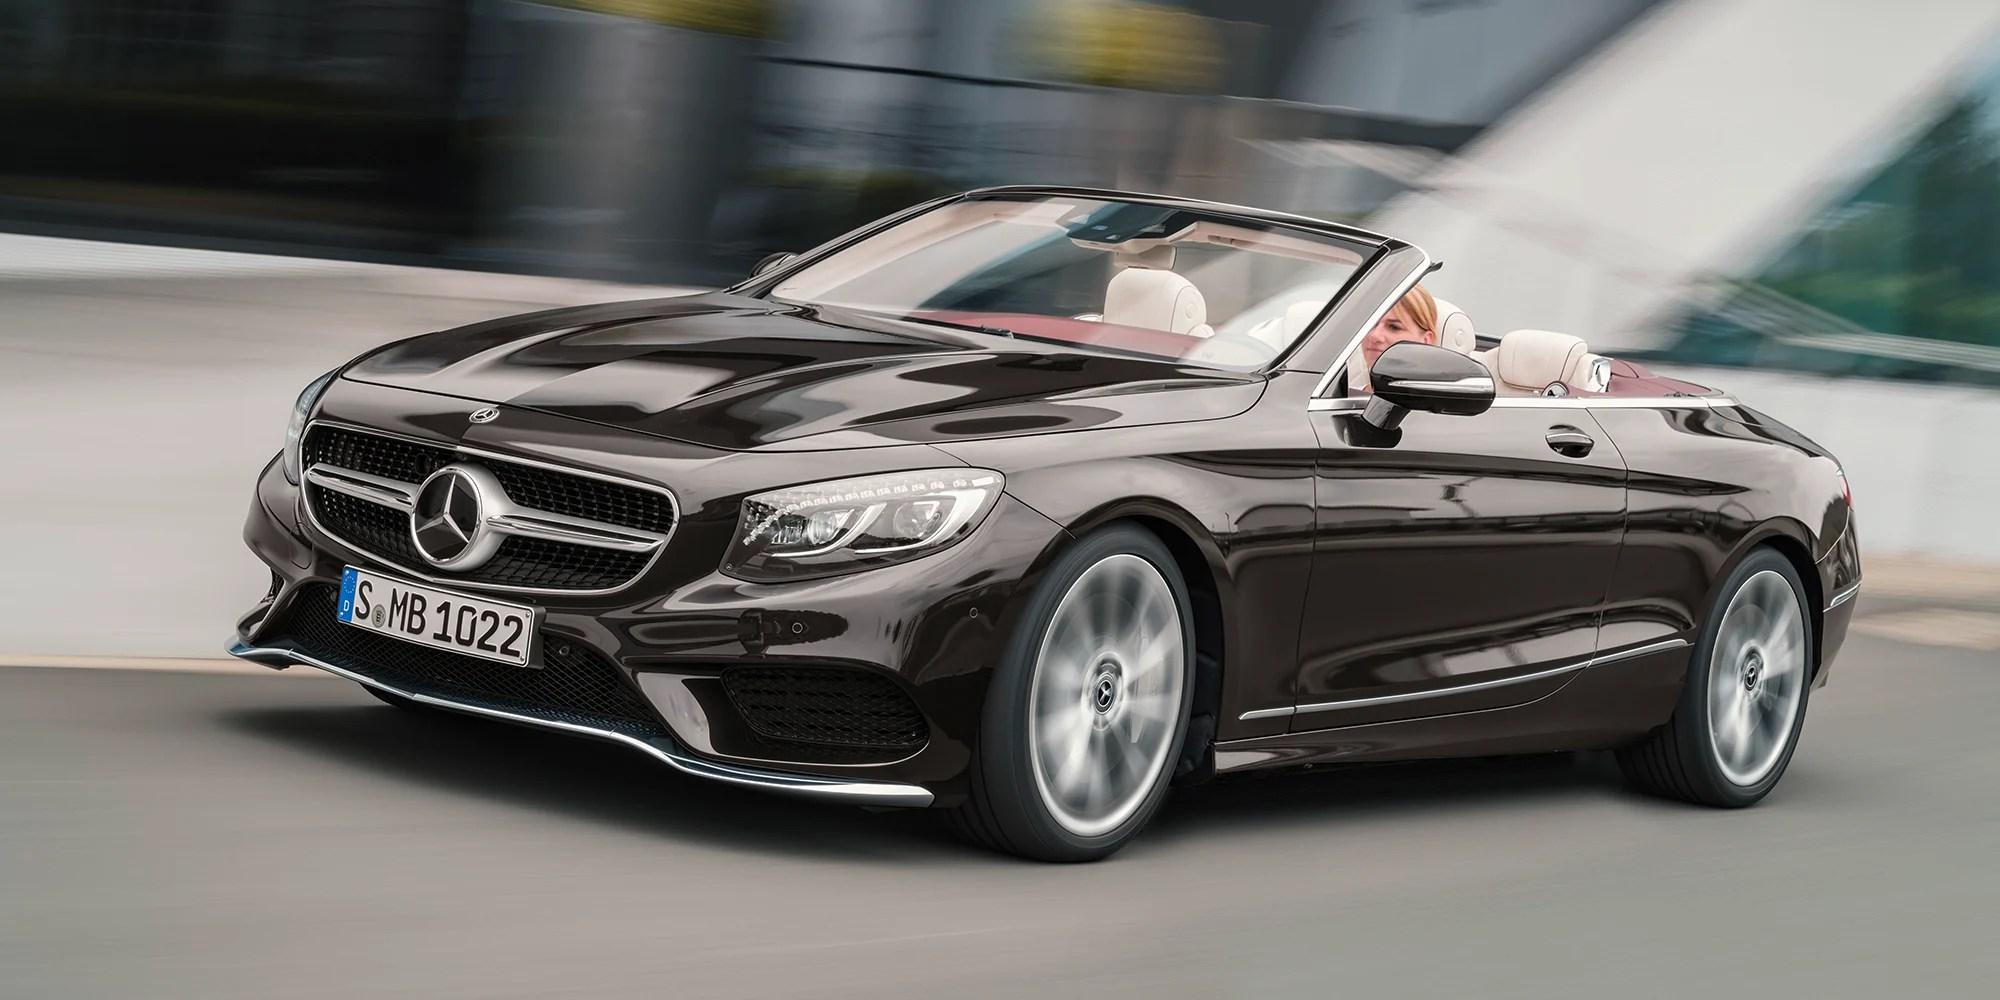 Mercedes Benz S Cl S550